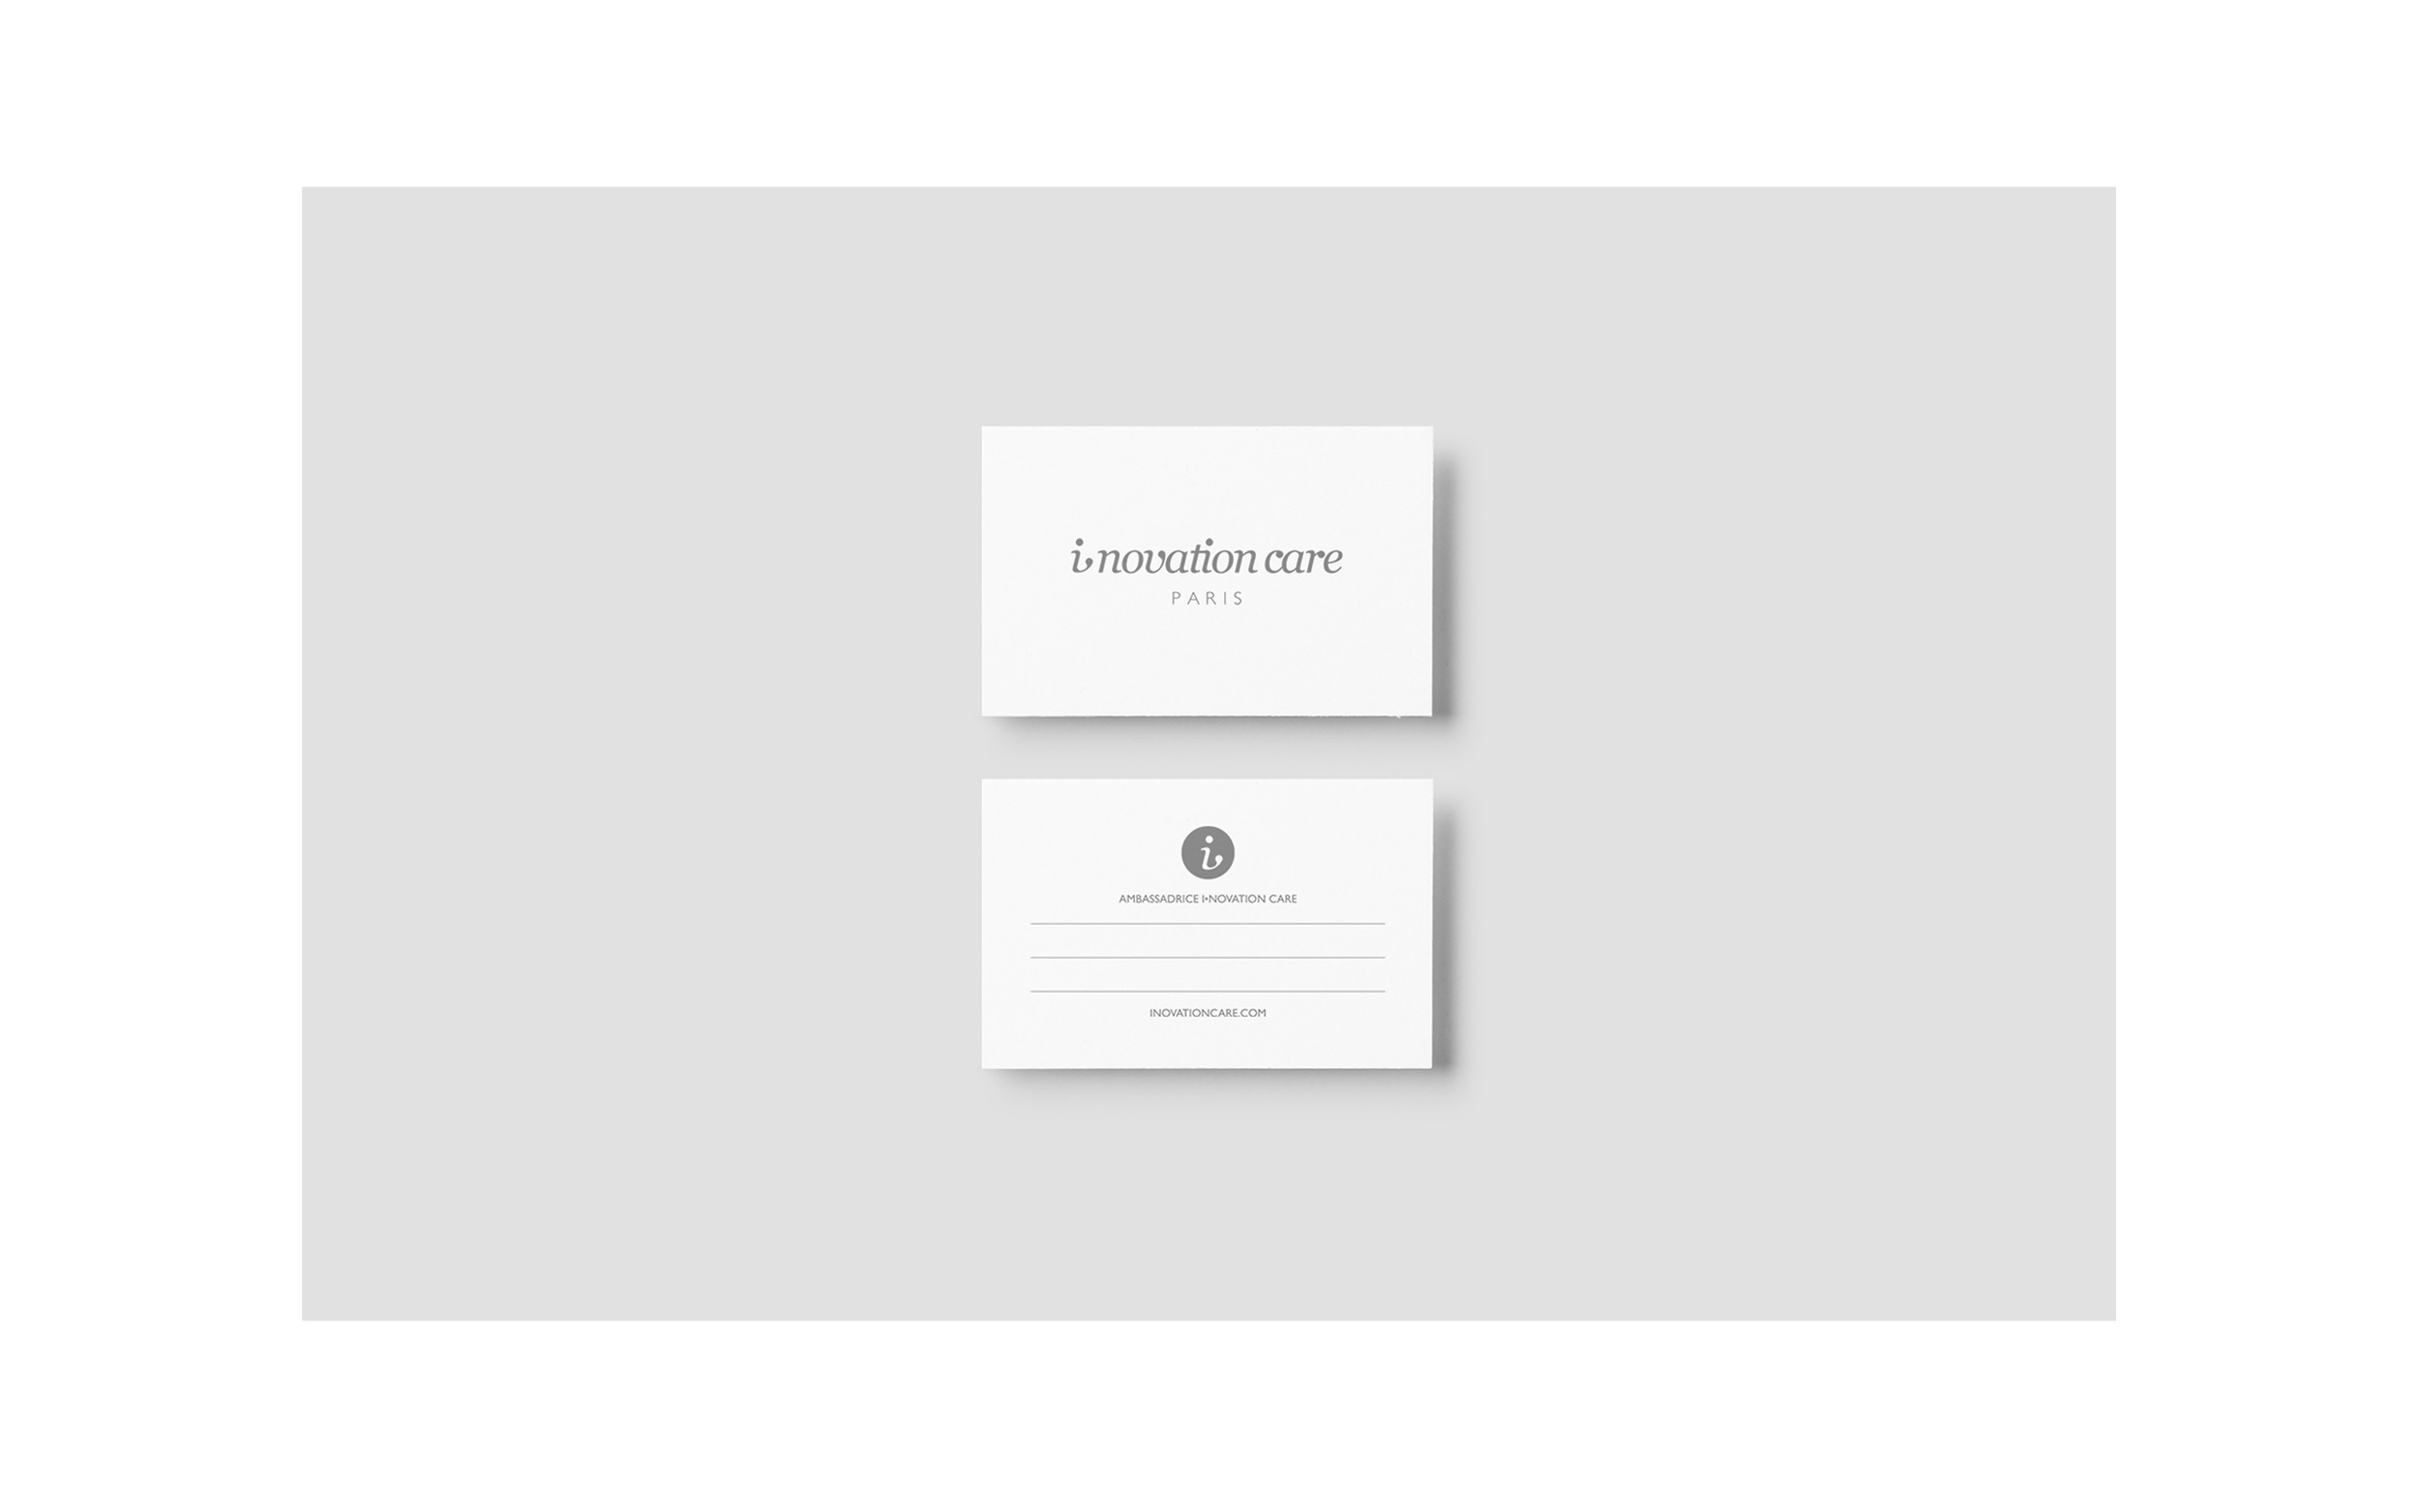 inovationcare-design-childer-06.jpg